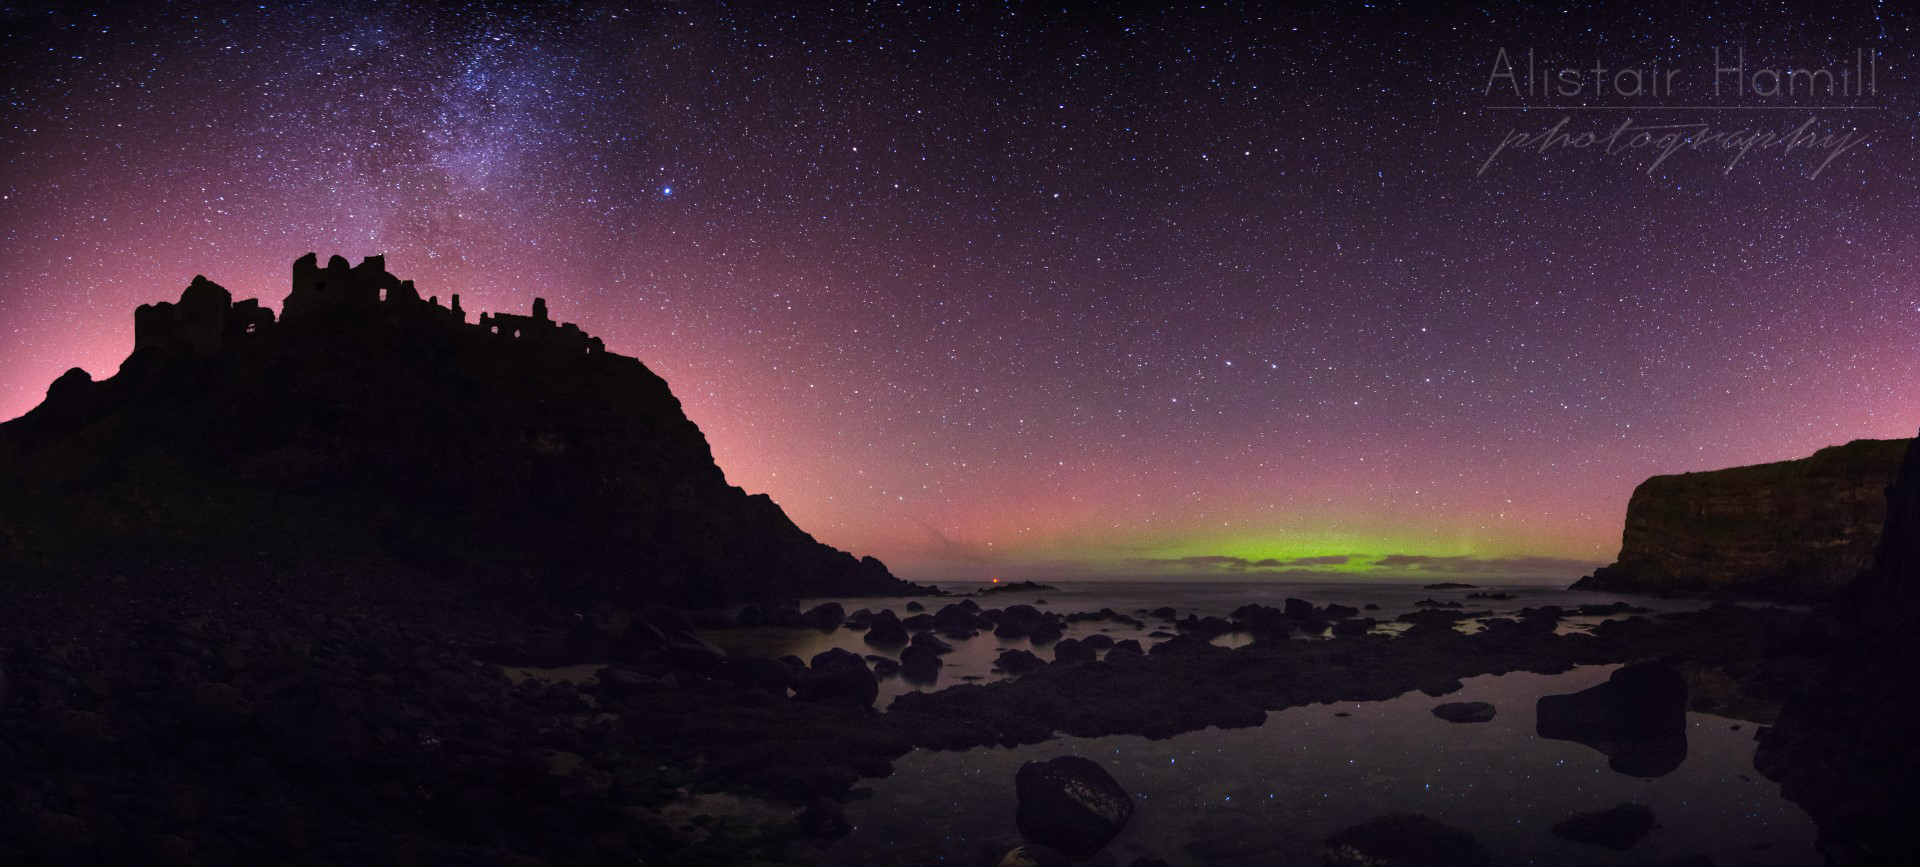 DUnluce aurora from down below pano 1 (Large) wm.jpg